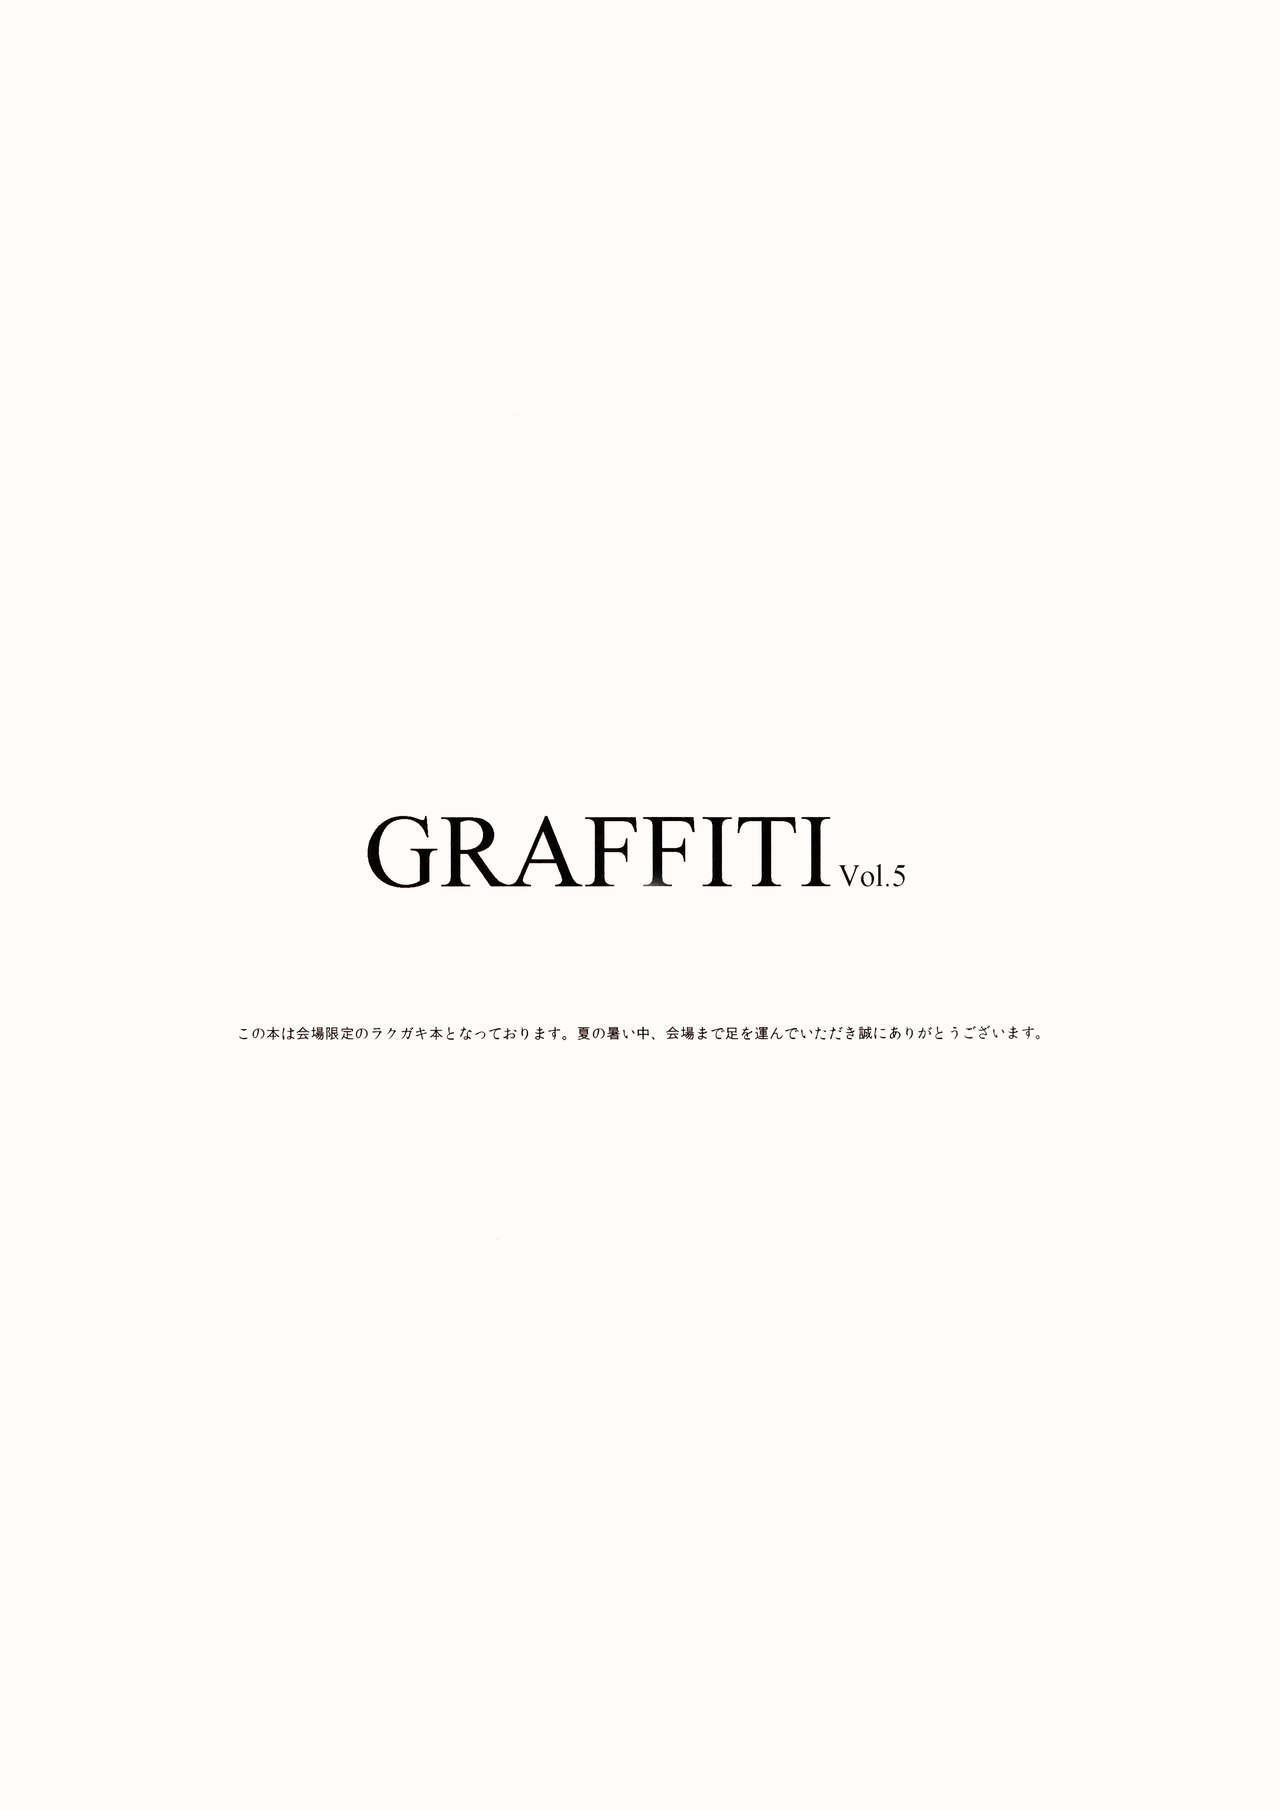 GRAFFITI Vol. 5 2